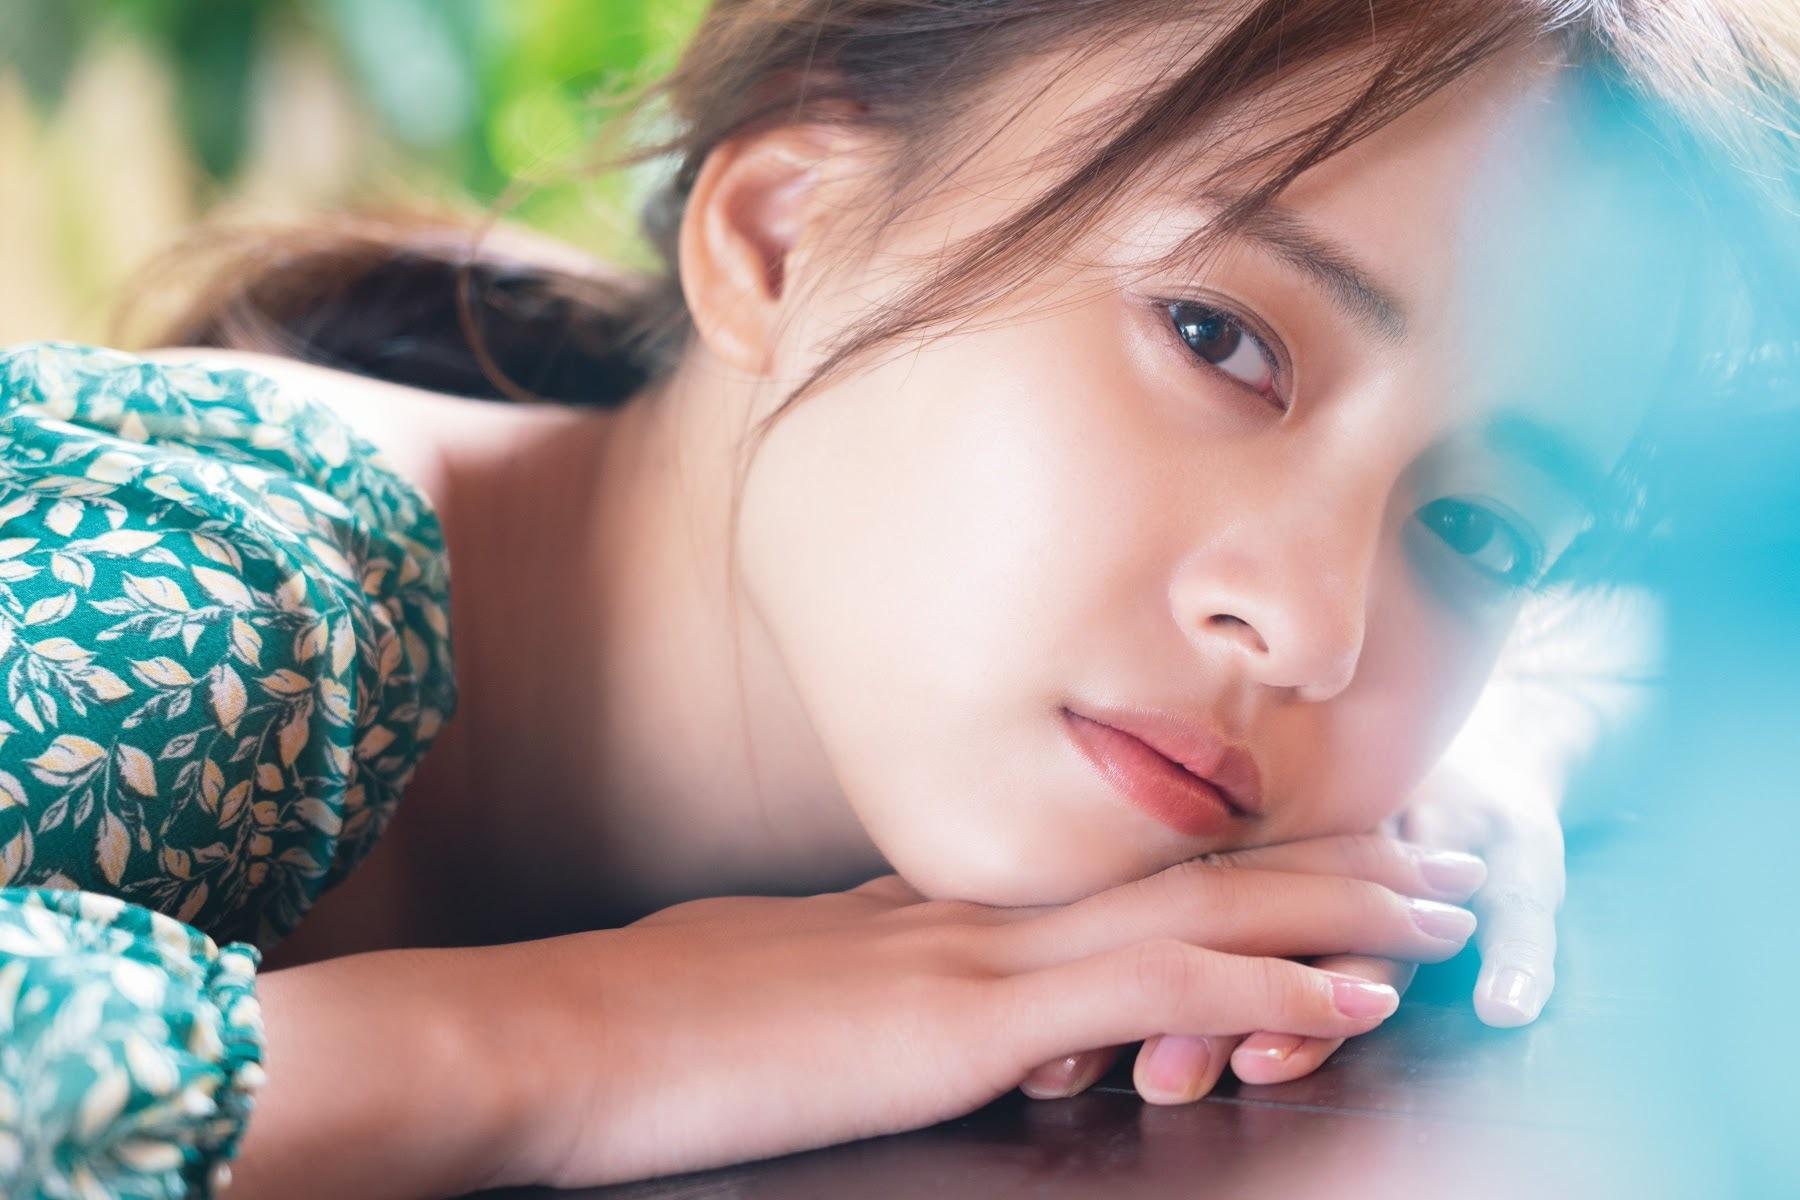 今田美樱-WEEKLY PLAYBOY 2021年第二十四期  高清套图 第56张